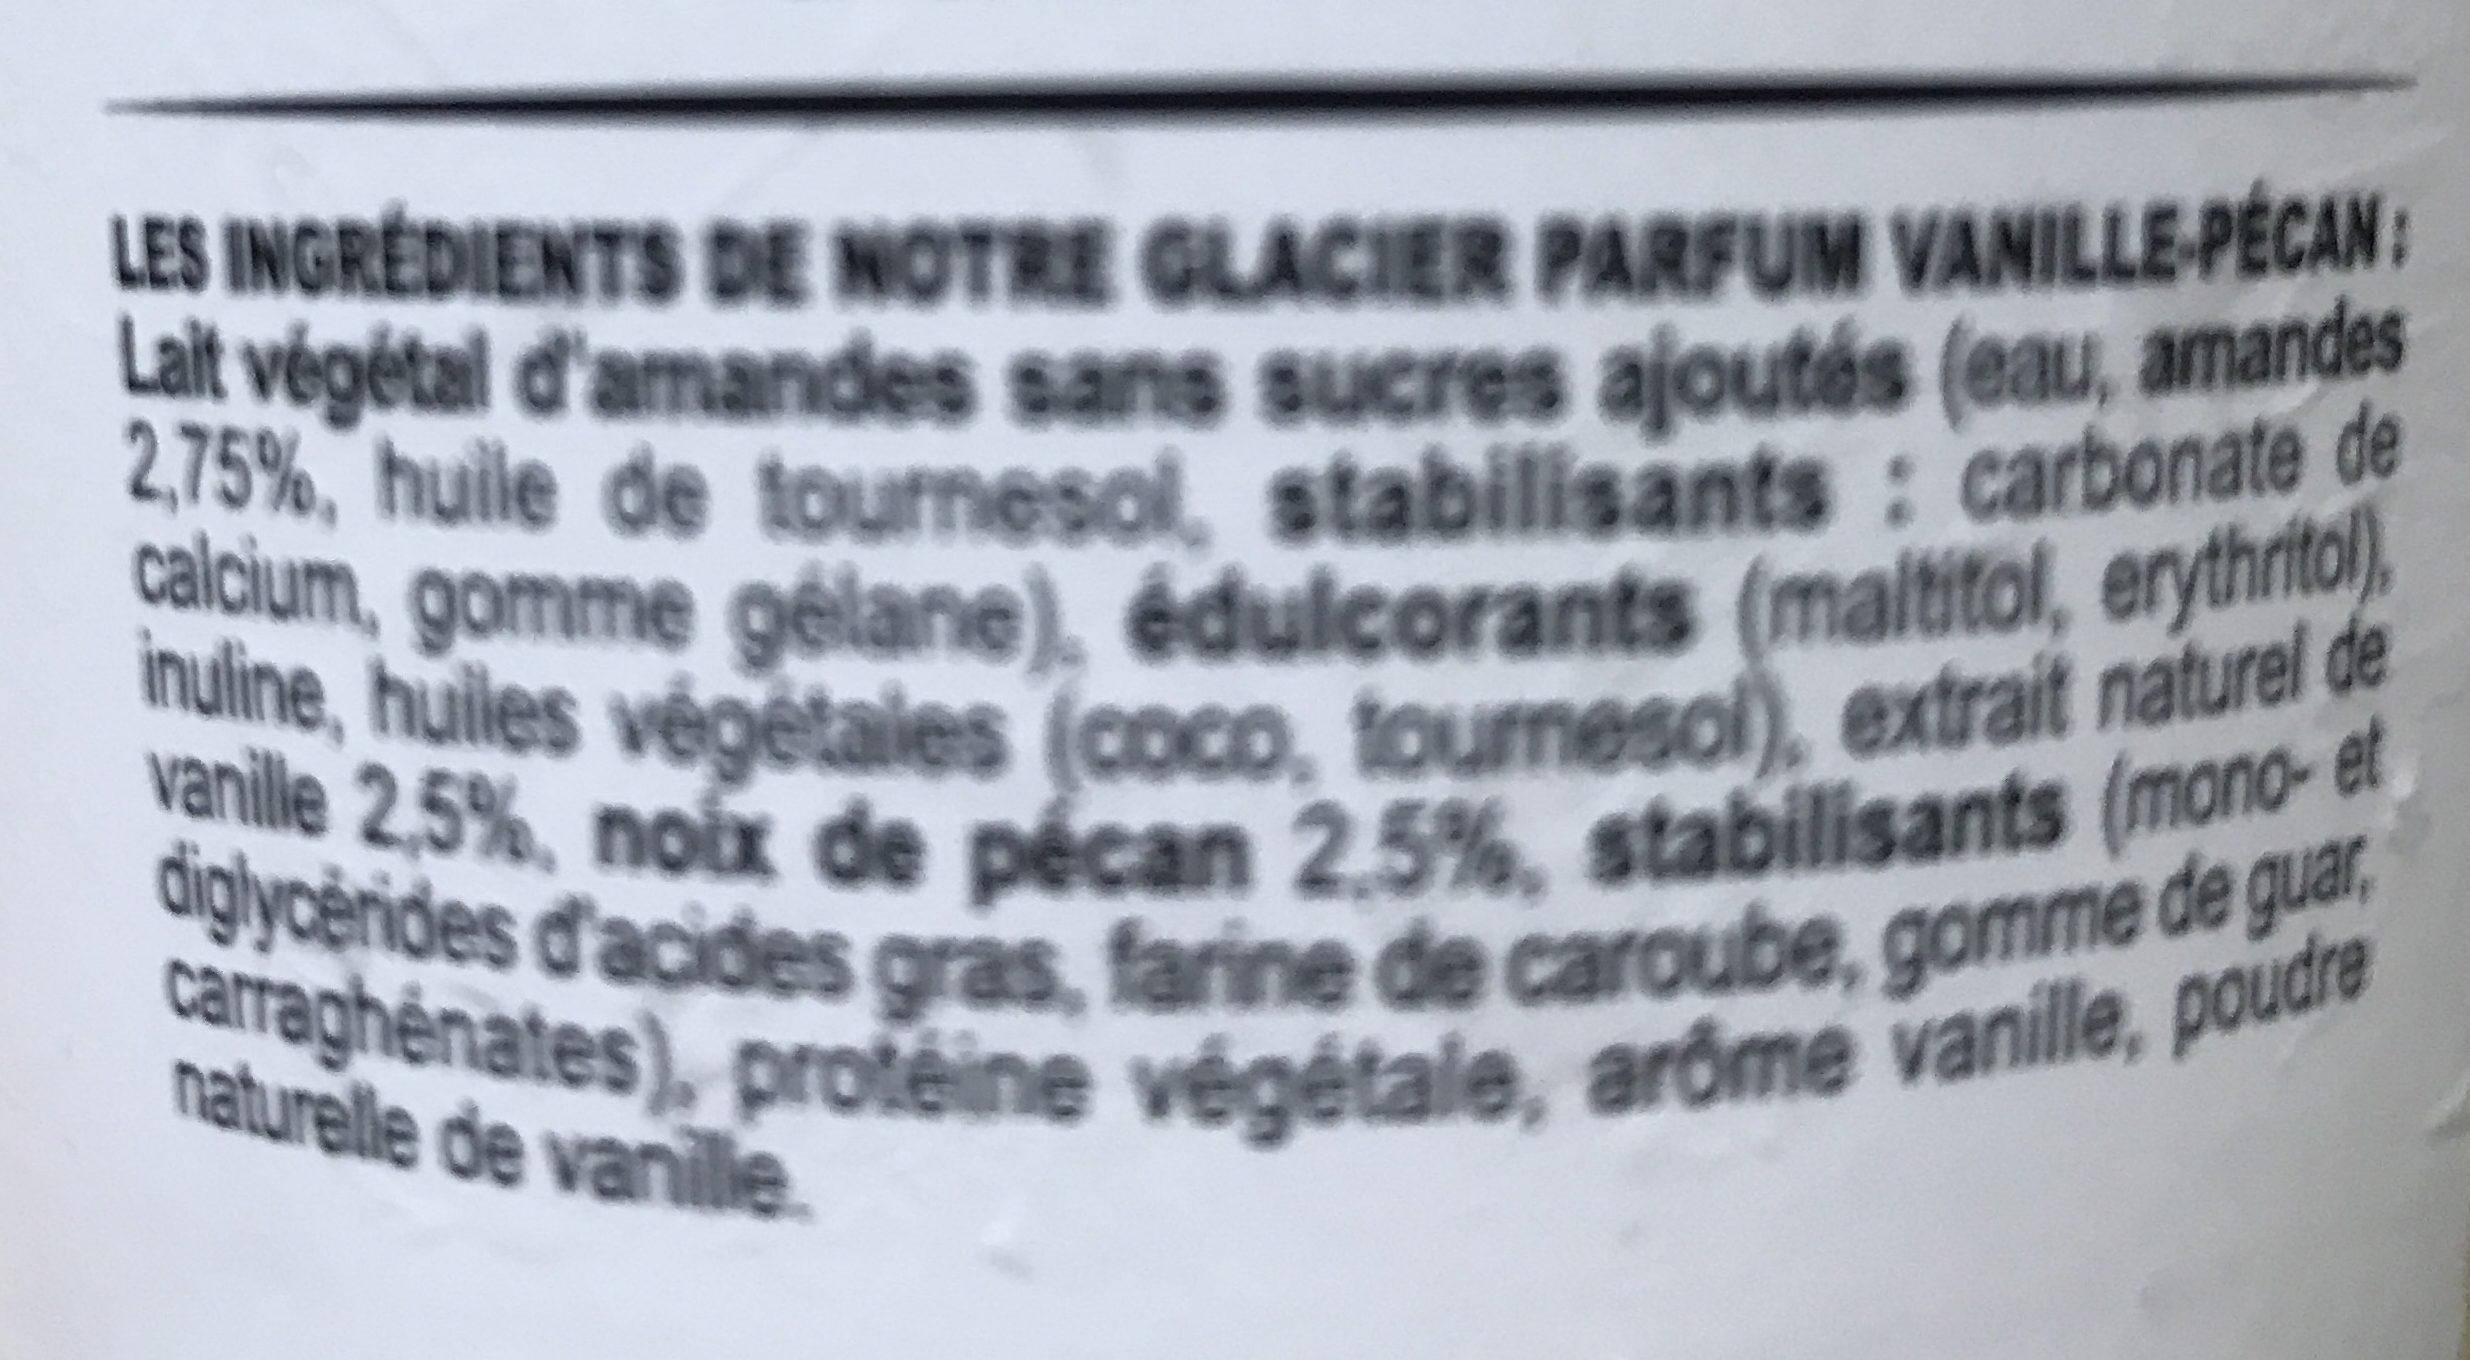 Glace vanille noix de pécan - Inhaltsstoffe - fr